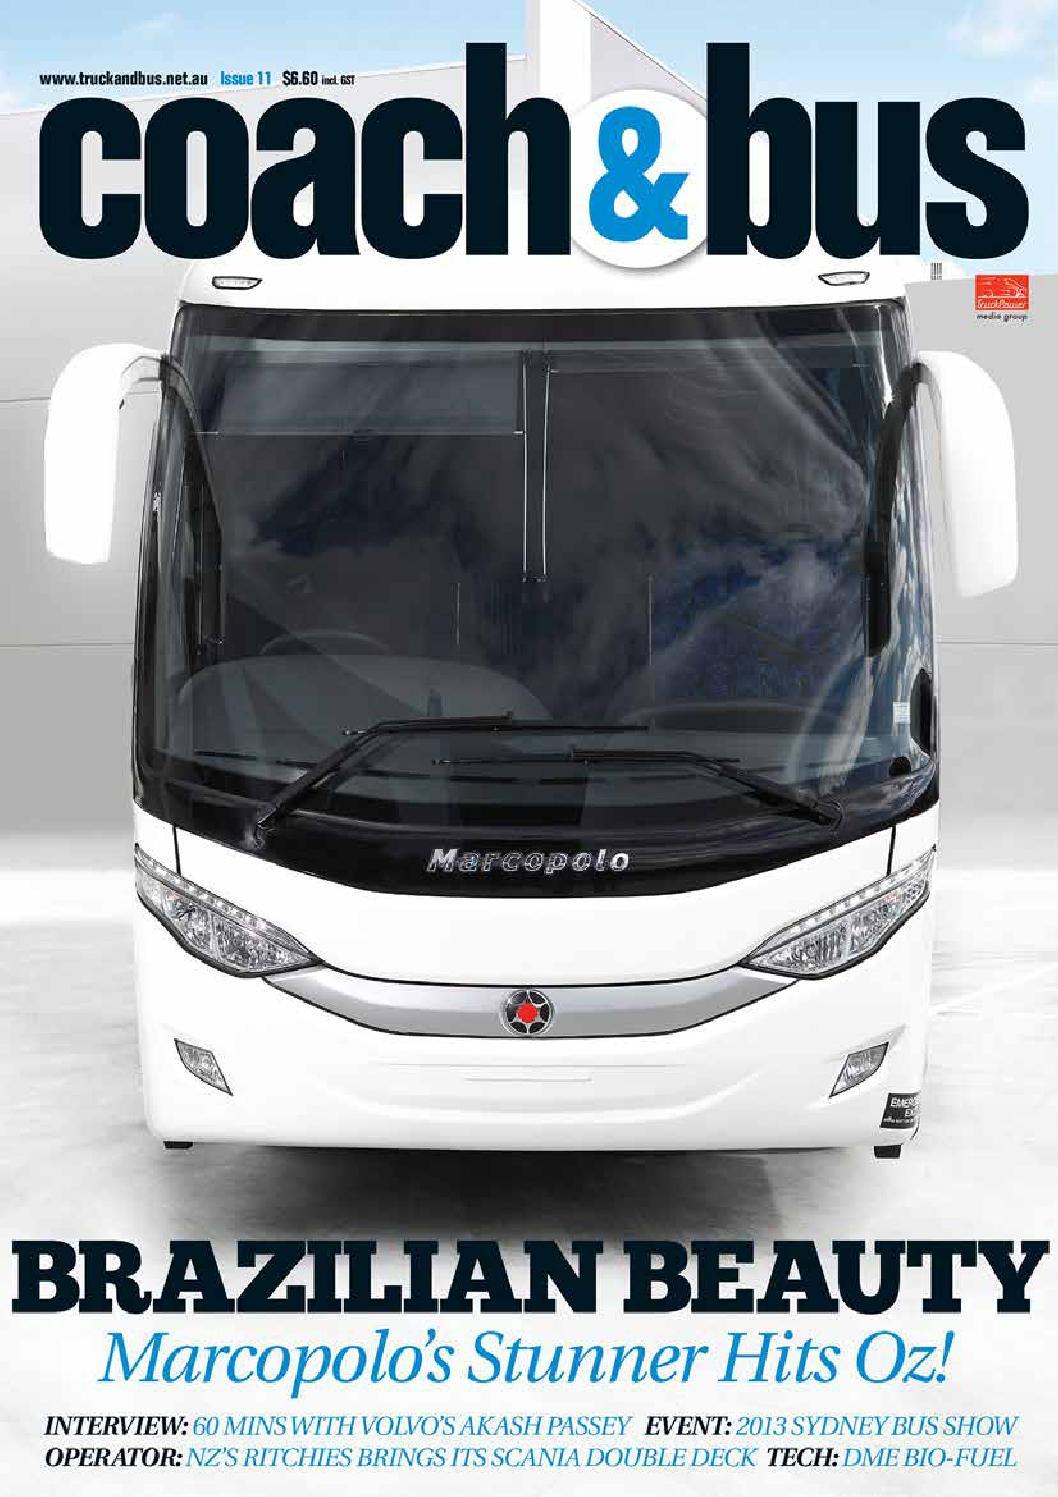 Coach bus issue 11 by transport publishing australia issuu falaconquin